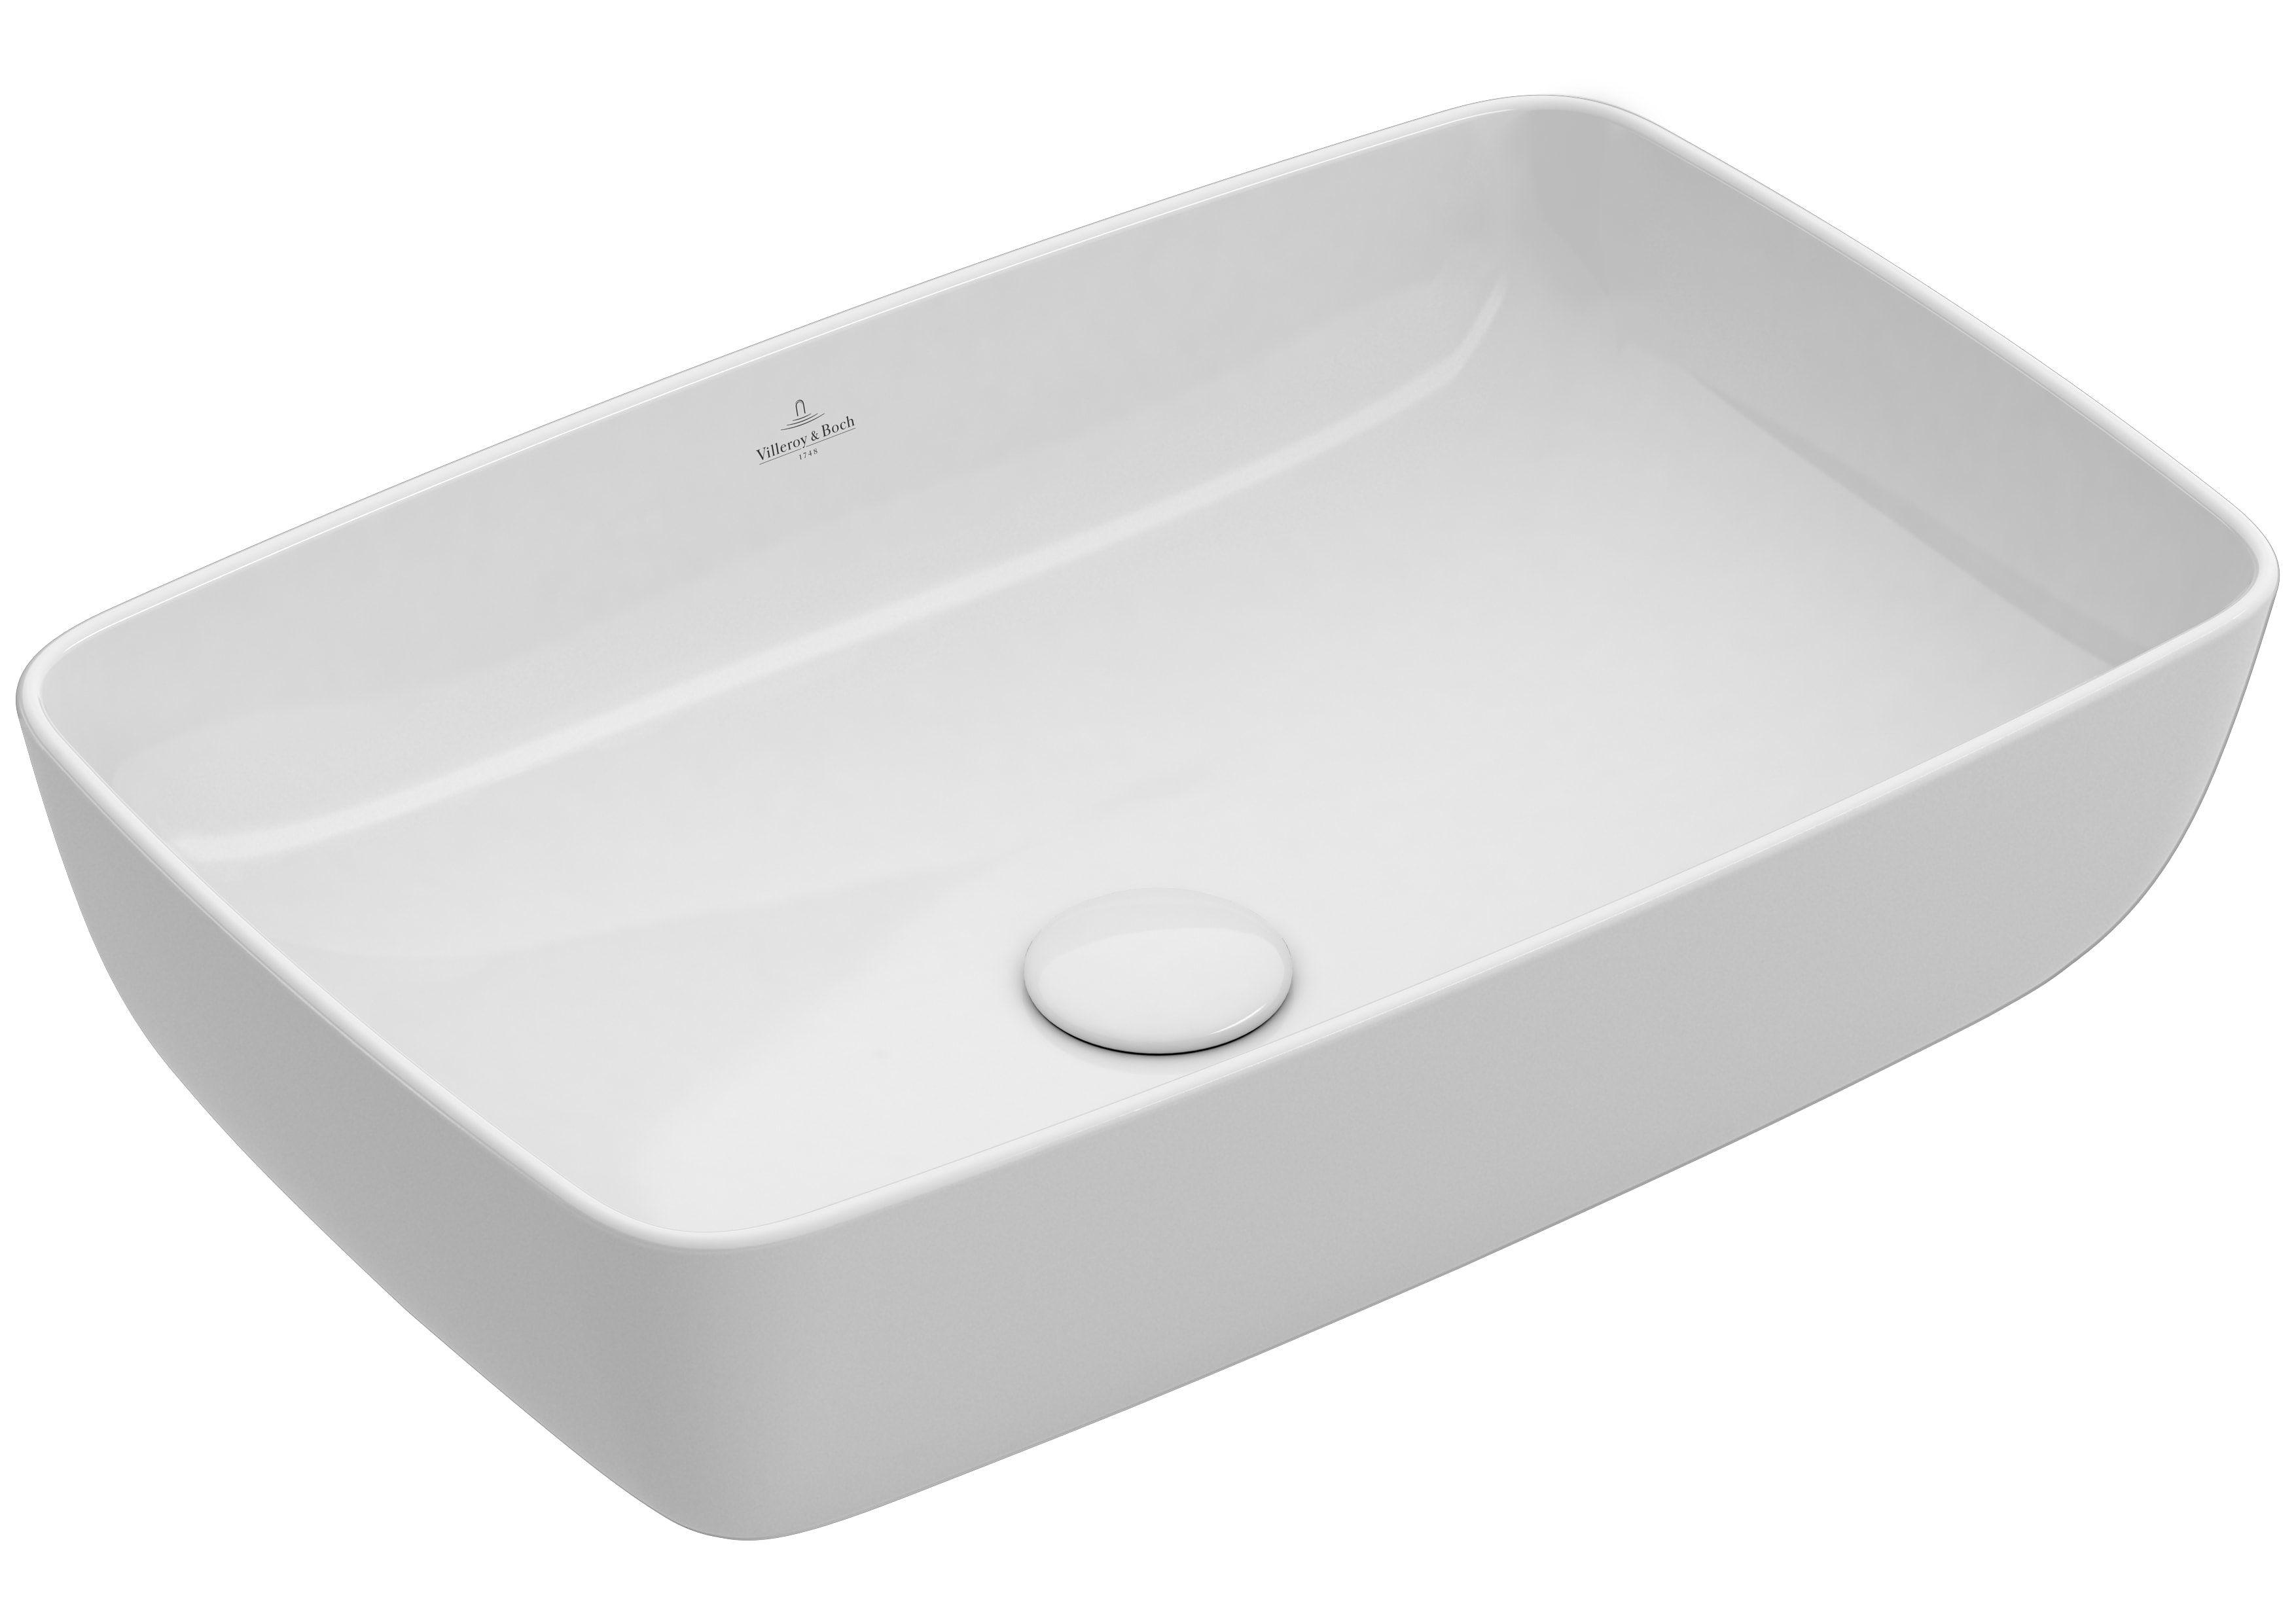 Artis Vessel Washbasin Rectangular By Villeroy And Boch List 640 At Dering Hall Wash Basin Sink Design Powder Room Sinks